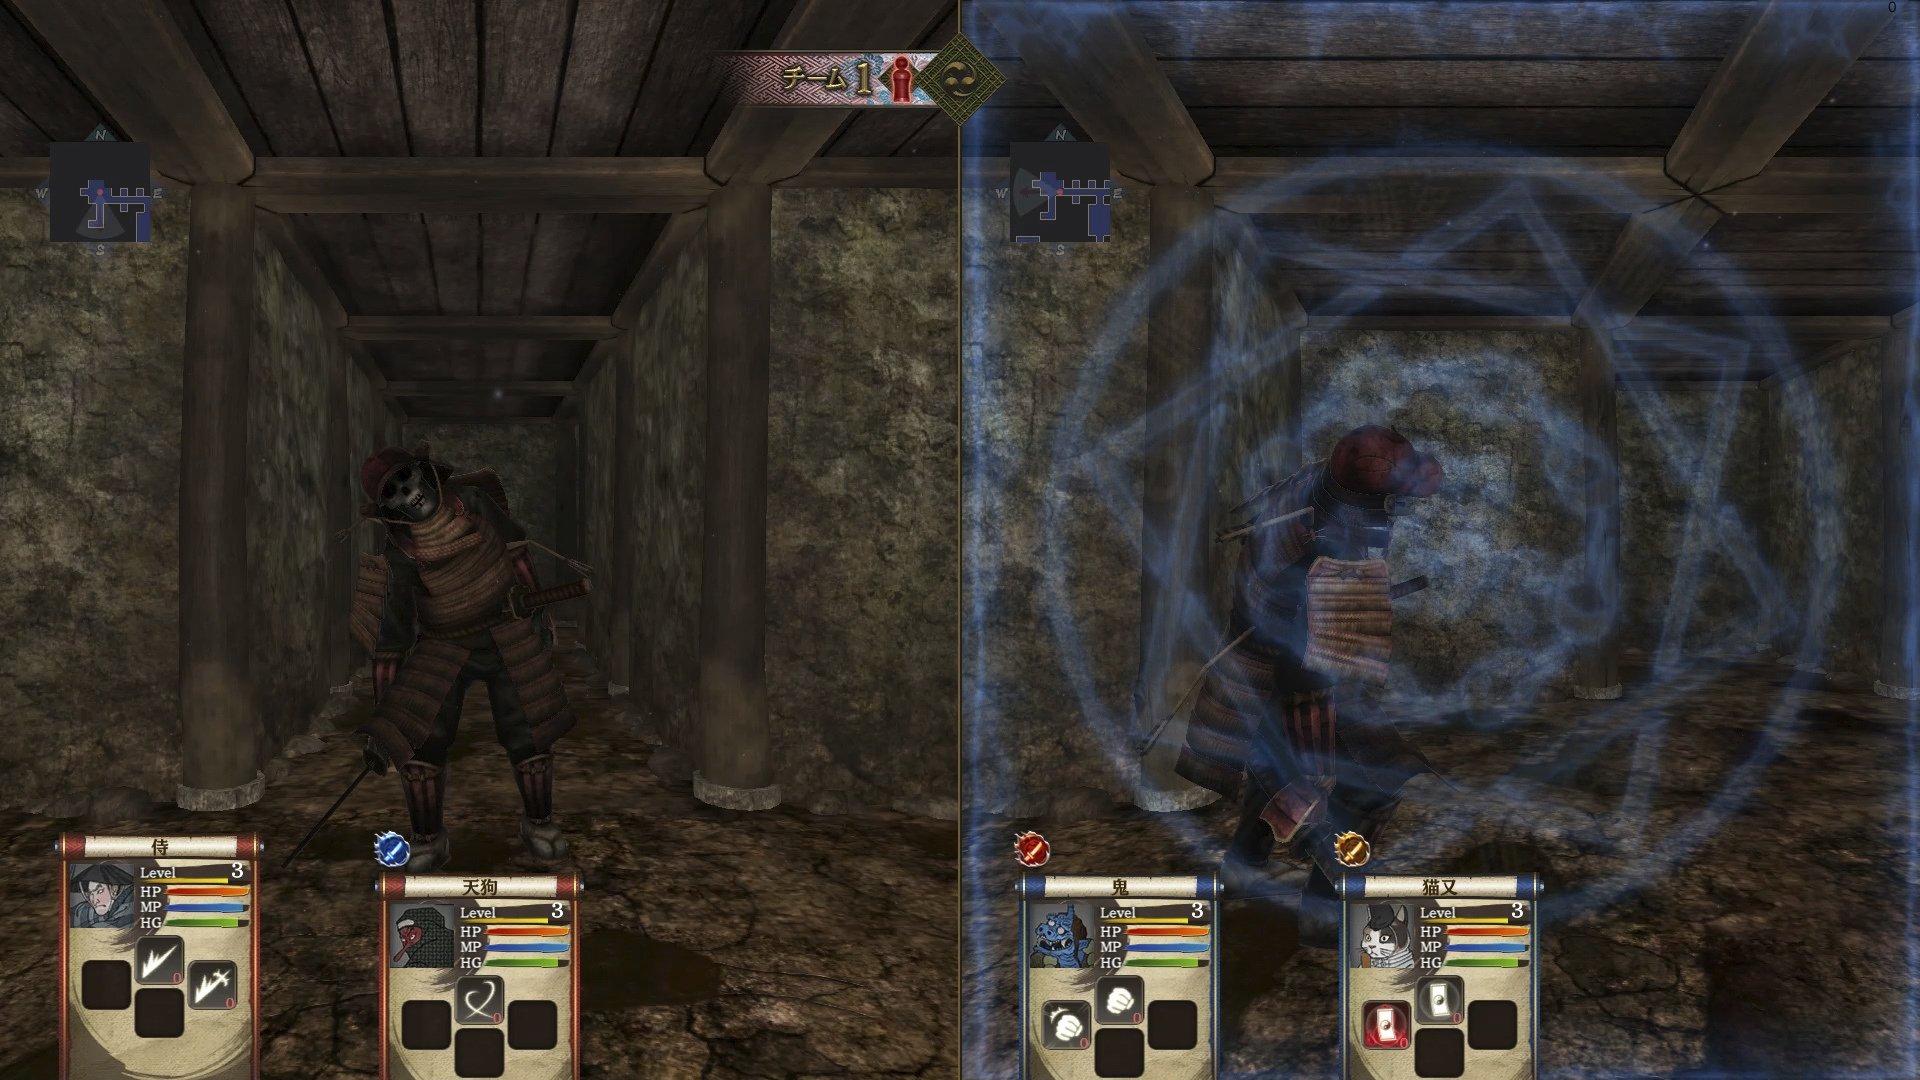 Haunted Dungeons: Hyakki Castle review